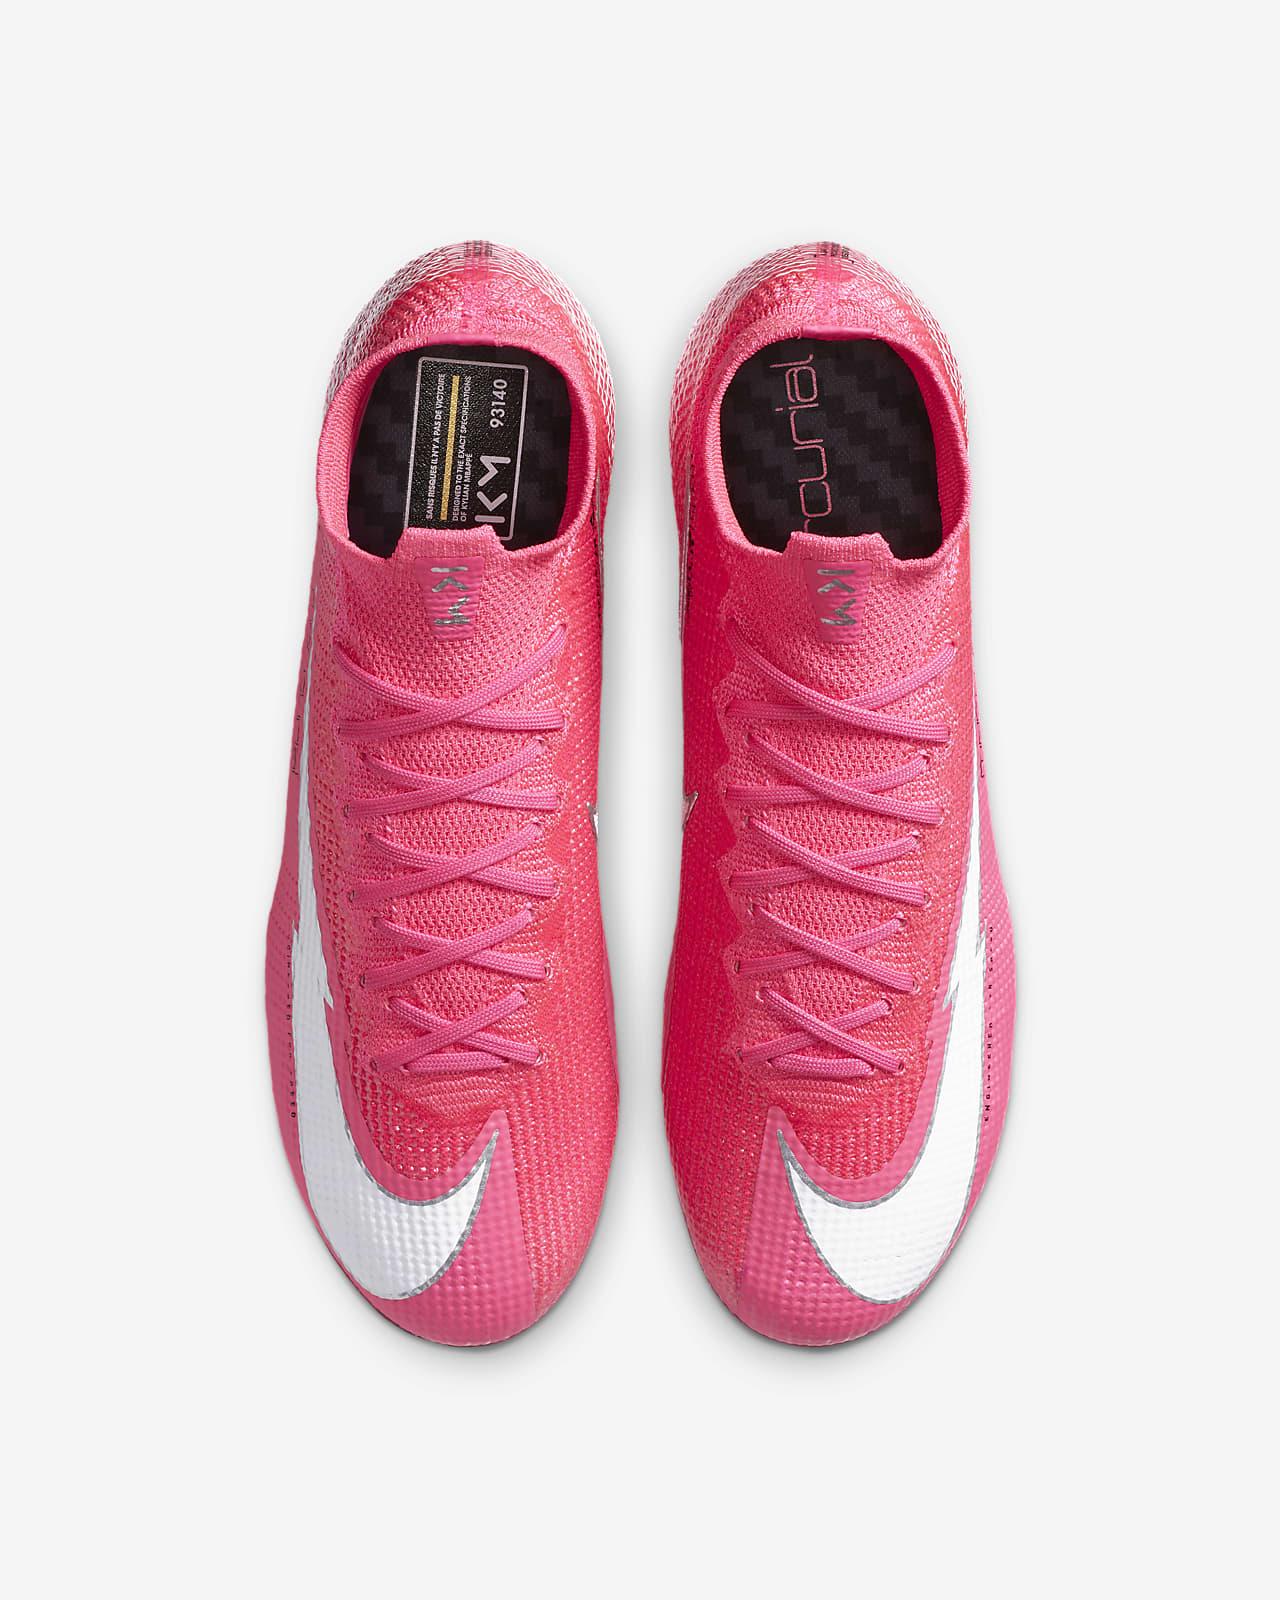 Nike Mercurial Superfly 7 Elite Mbappé